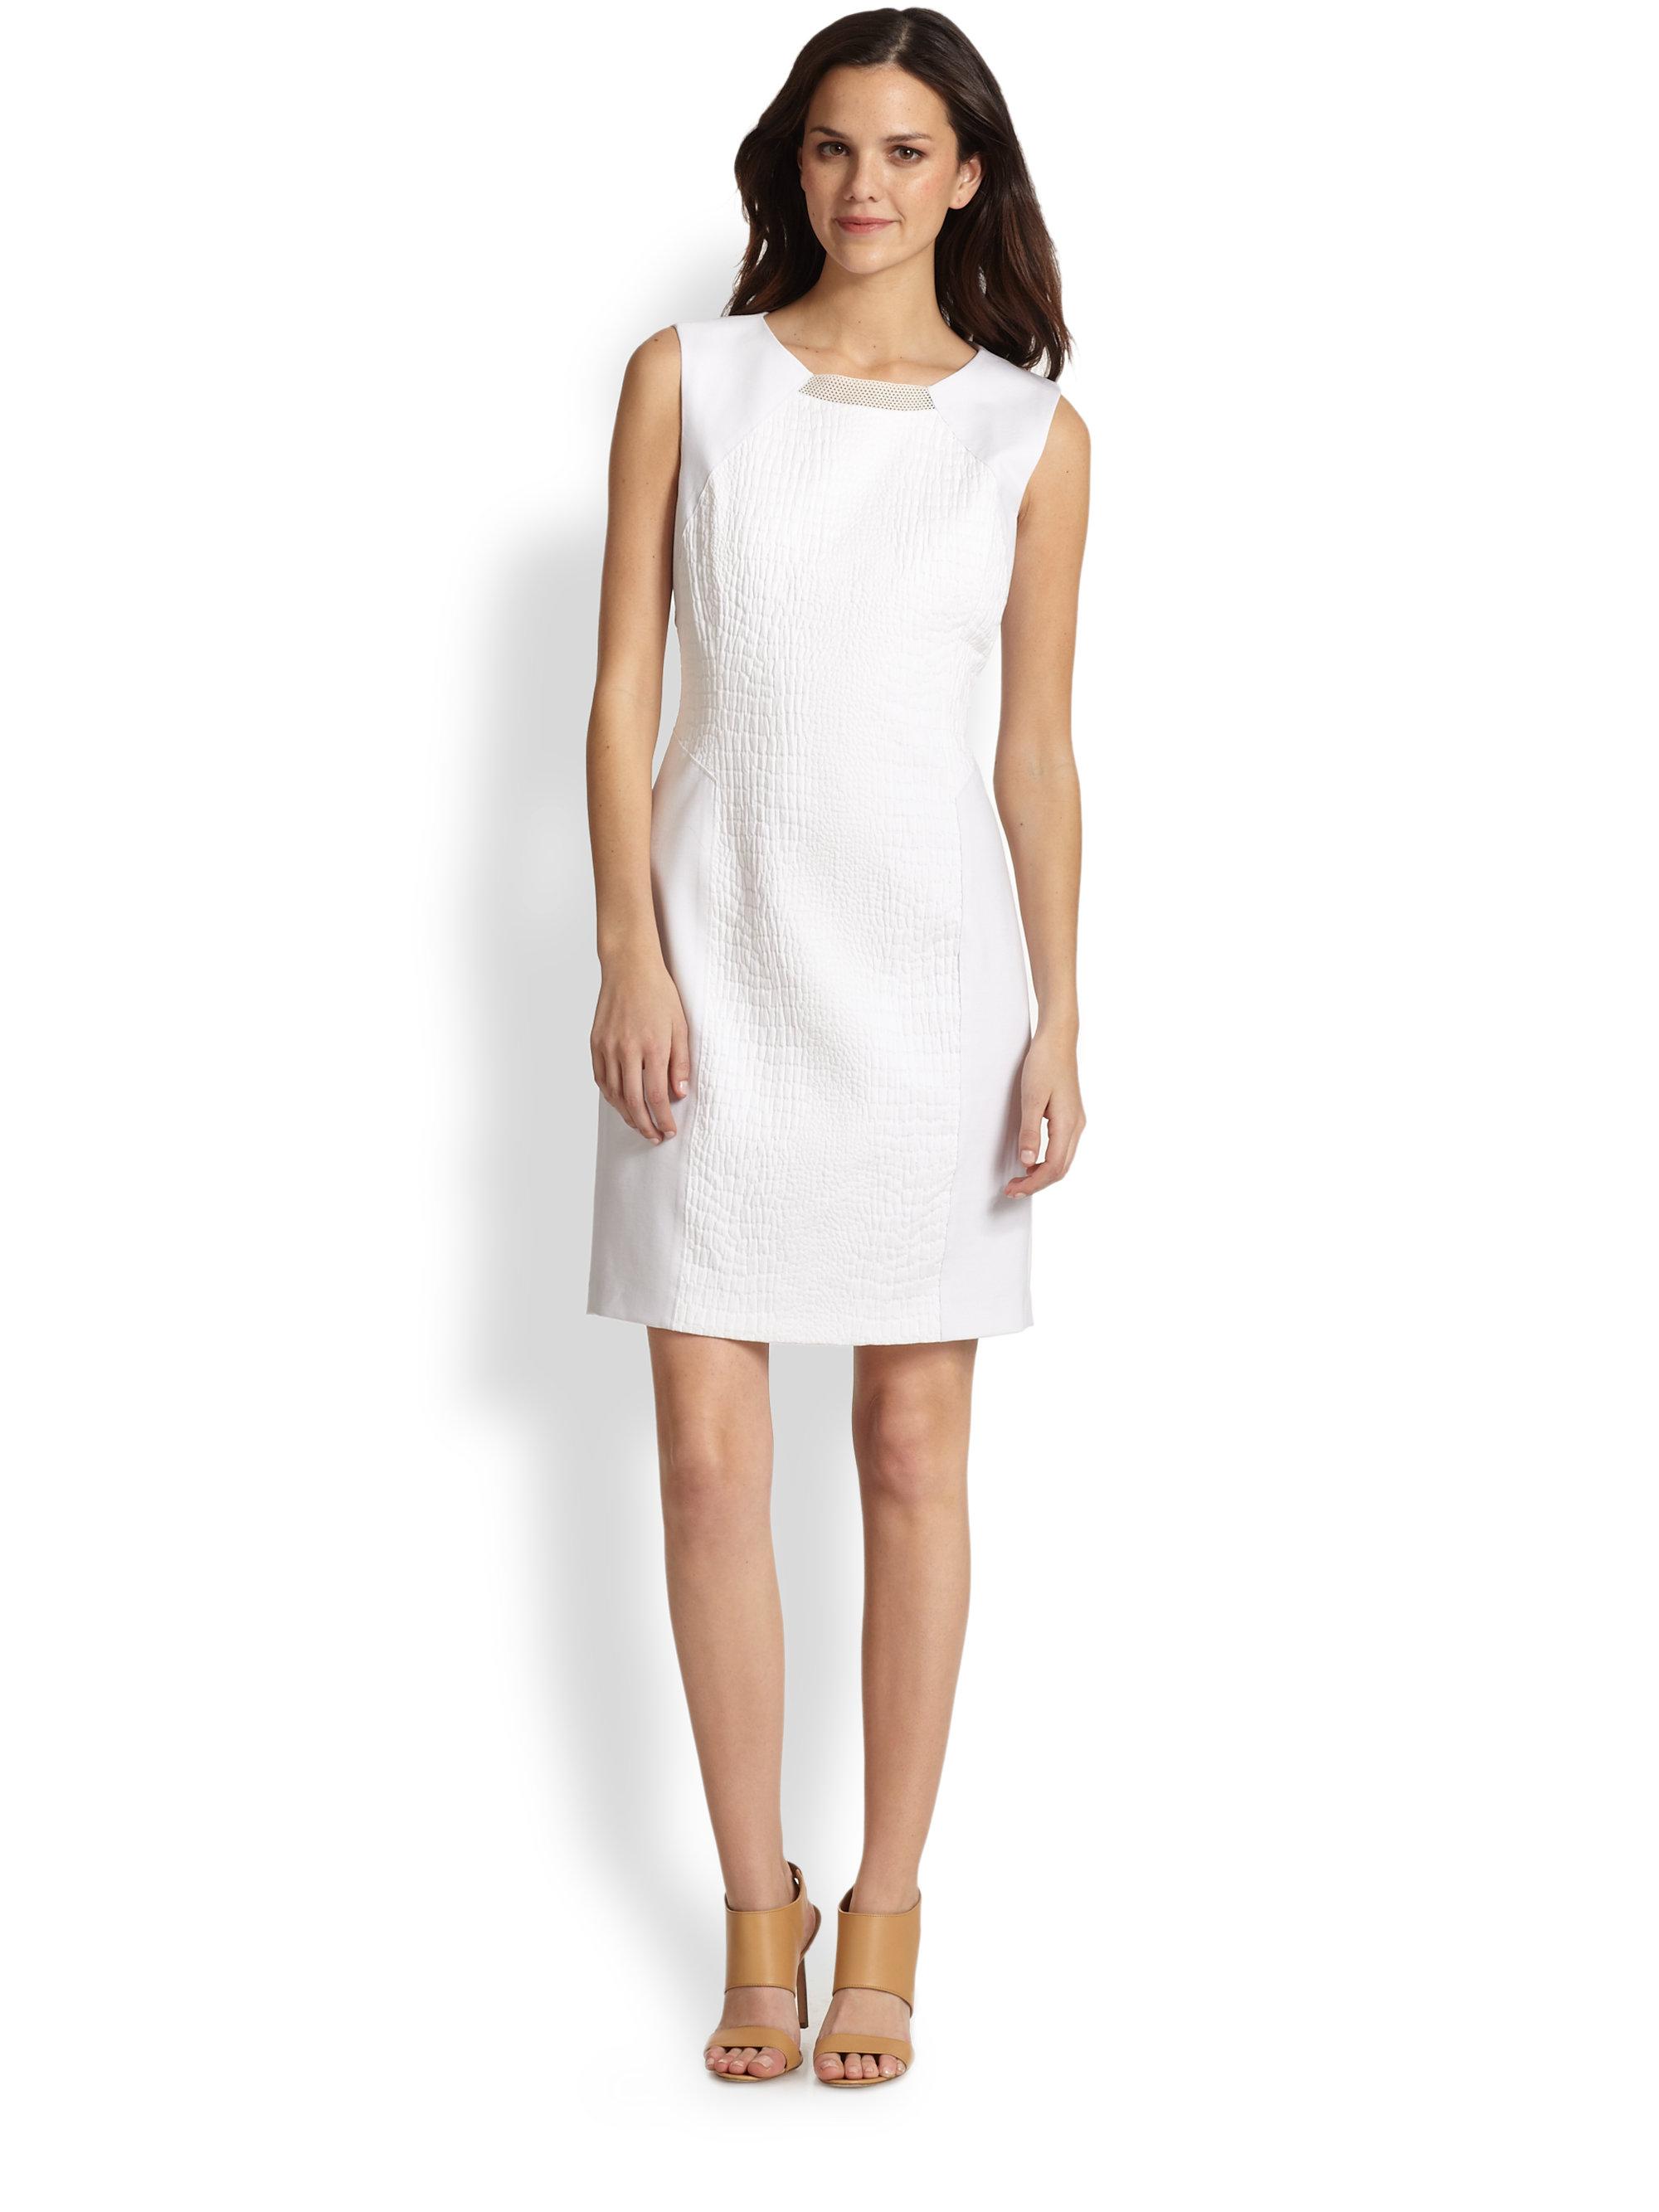 60206fab57 Lyst - Elie Tahari Gramercy Dress in White